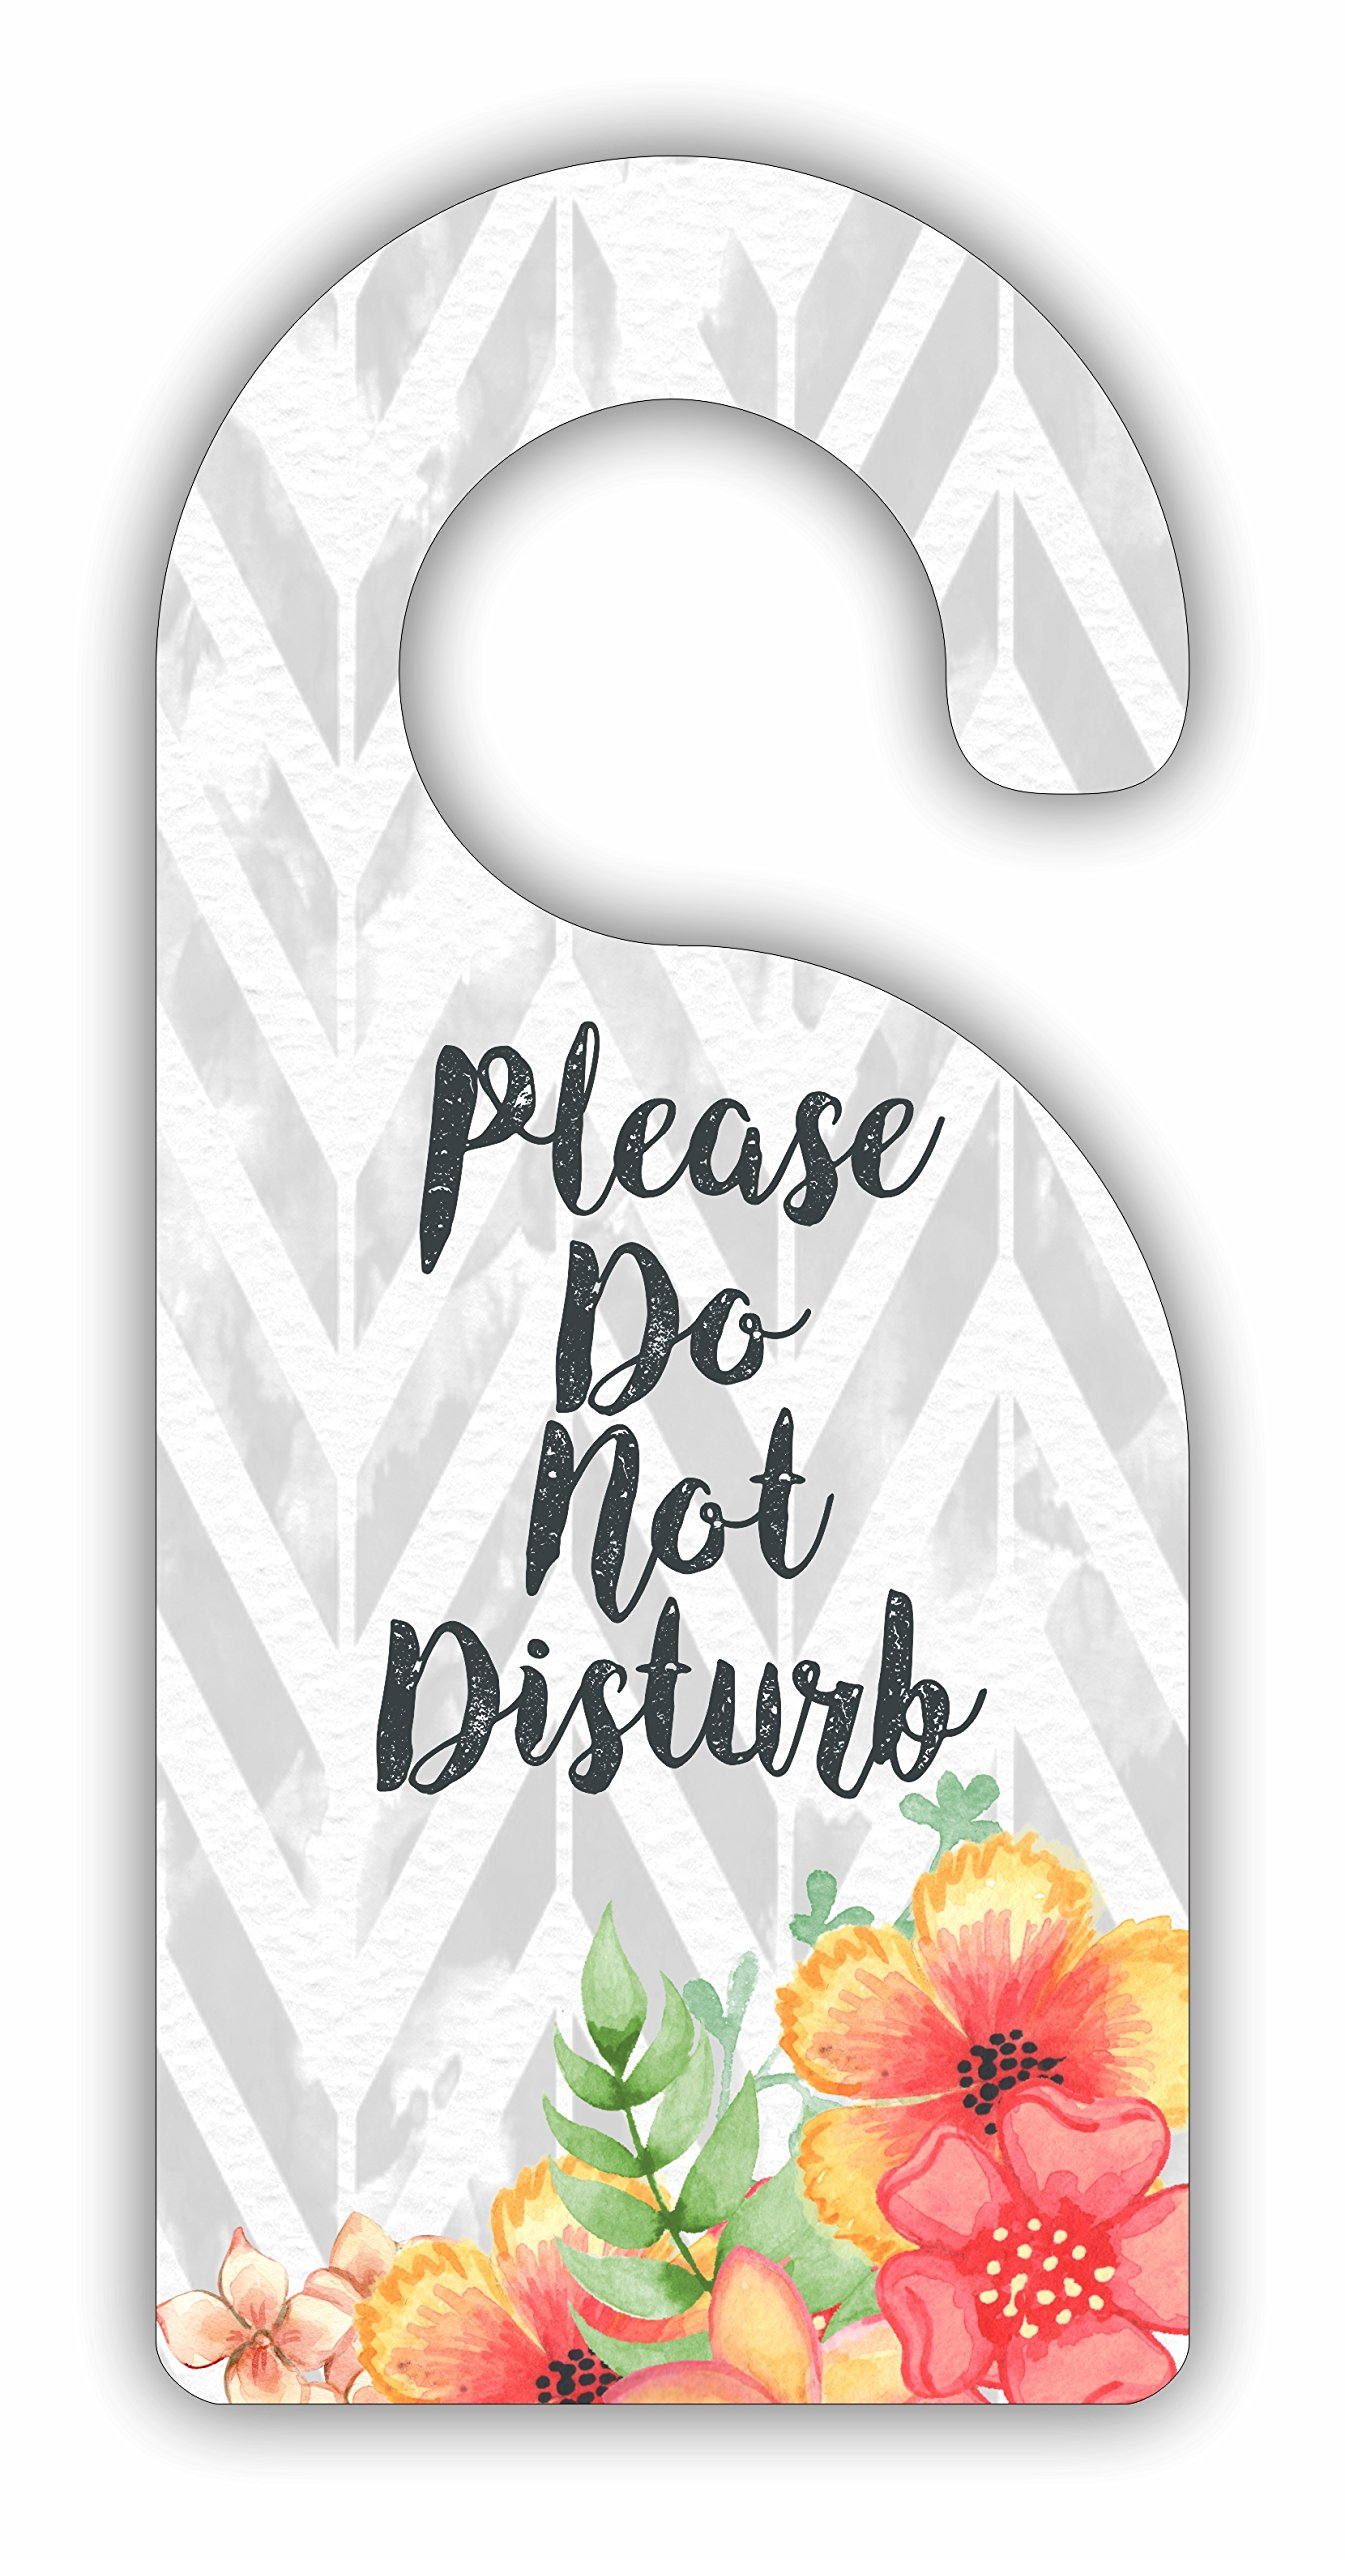 Please Do Not Disturb - Flowers on Chevrons - Room Door Sign Hanger - Hardboard - Glossy Finish